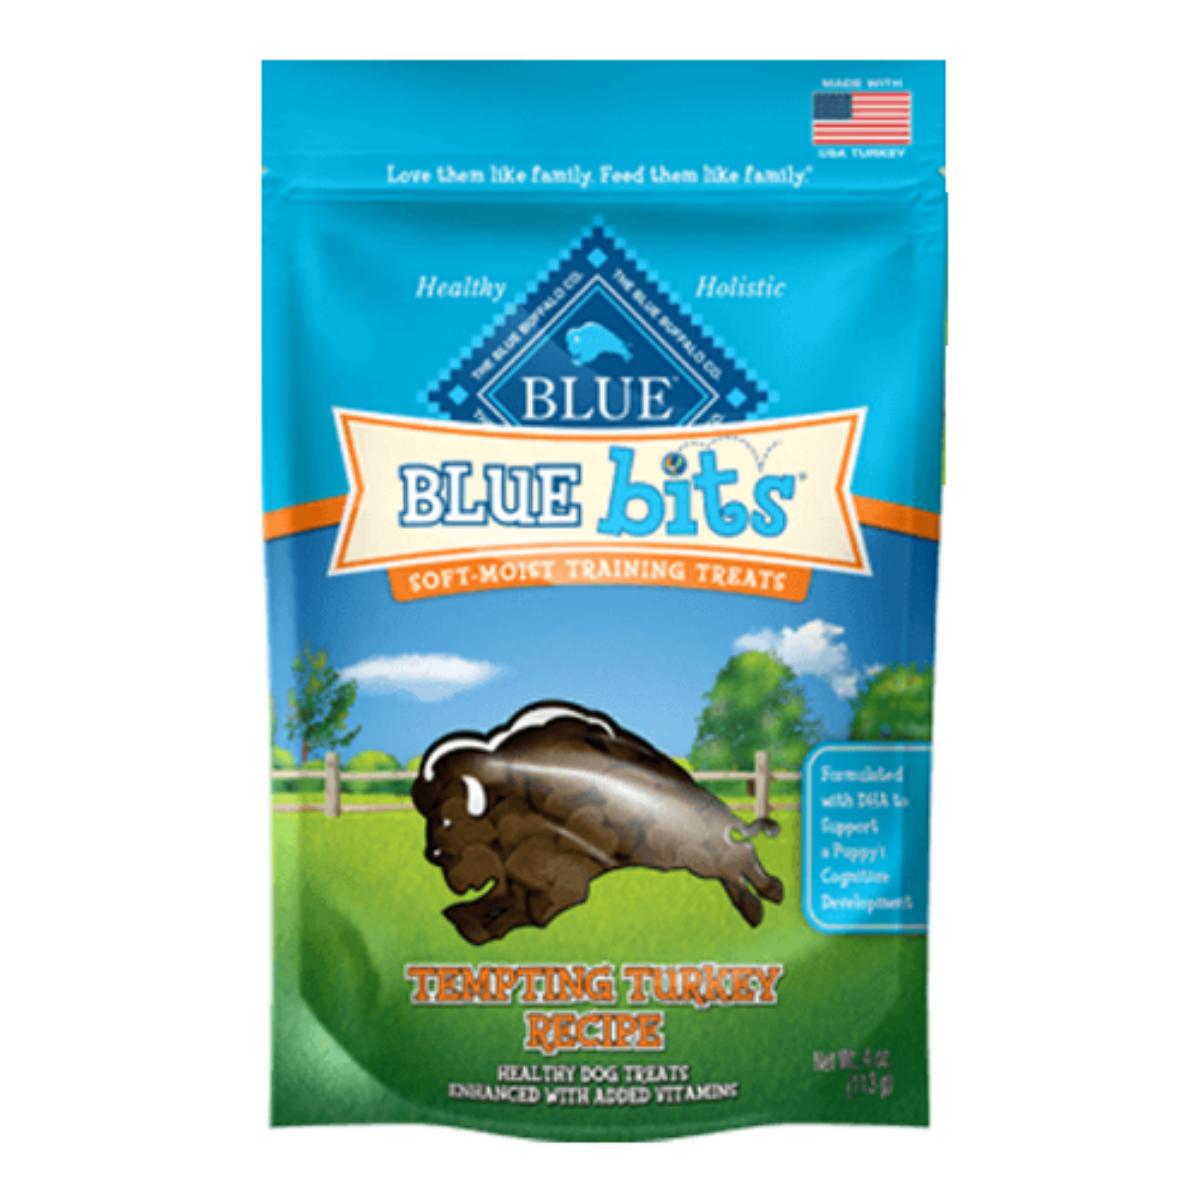 Blue Bits Soft-Moist Dog Training Treats - Tempting Turkey